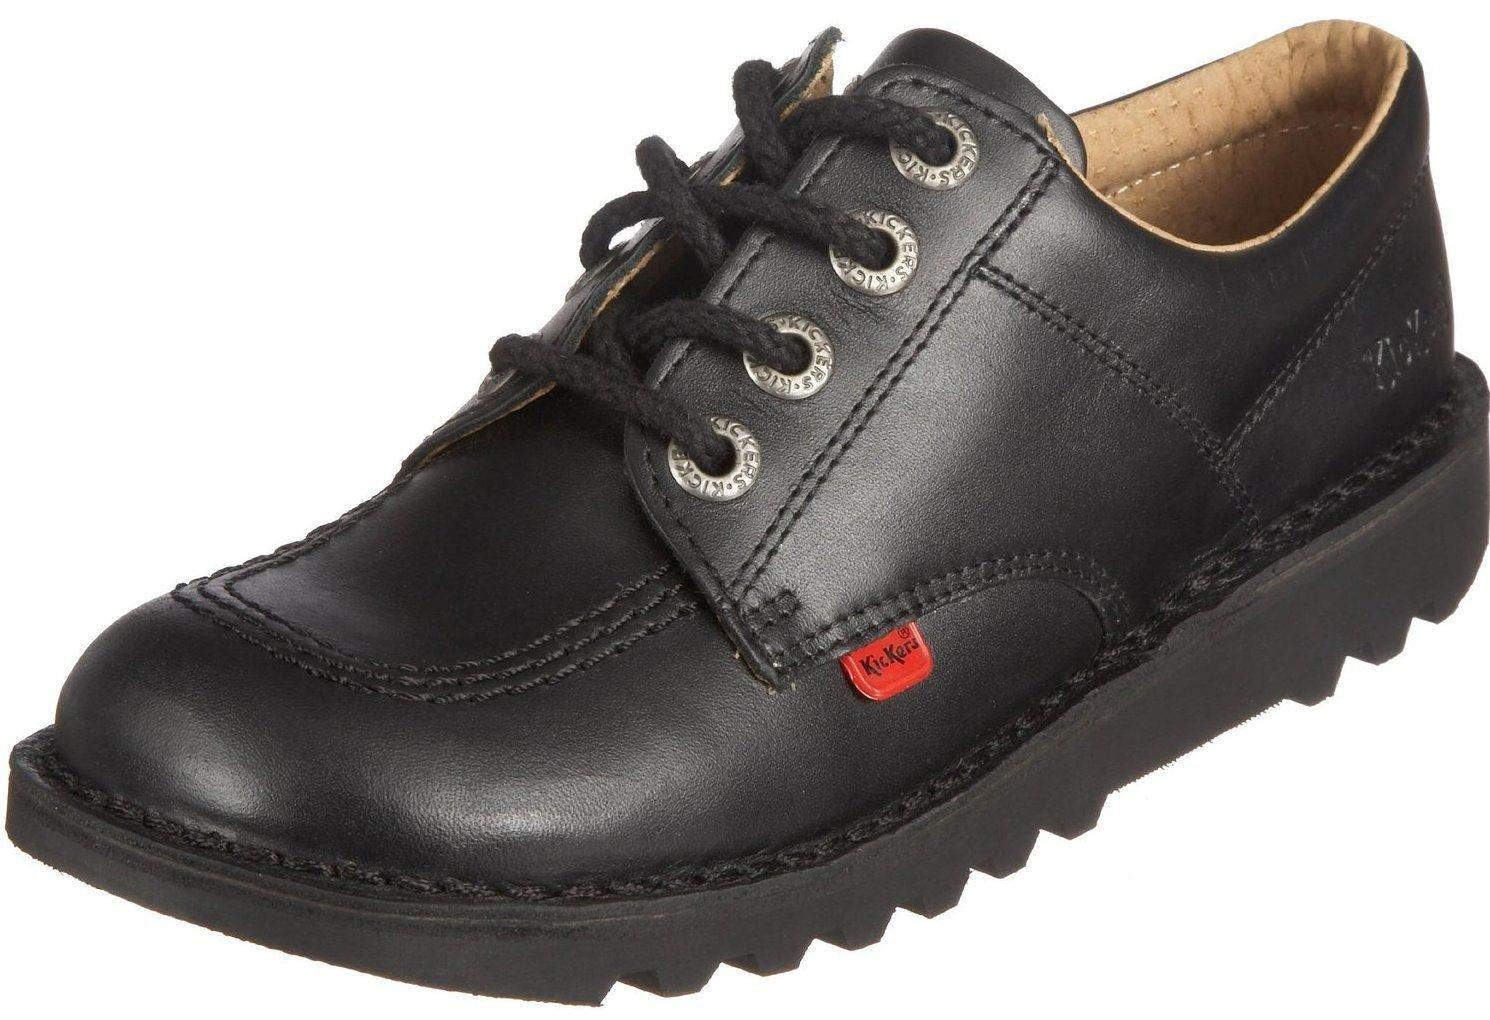 Kickers Kick Lo Core Black Leather Unisex Lace Up School Shoes-36